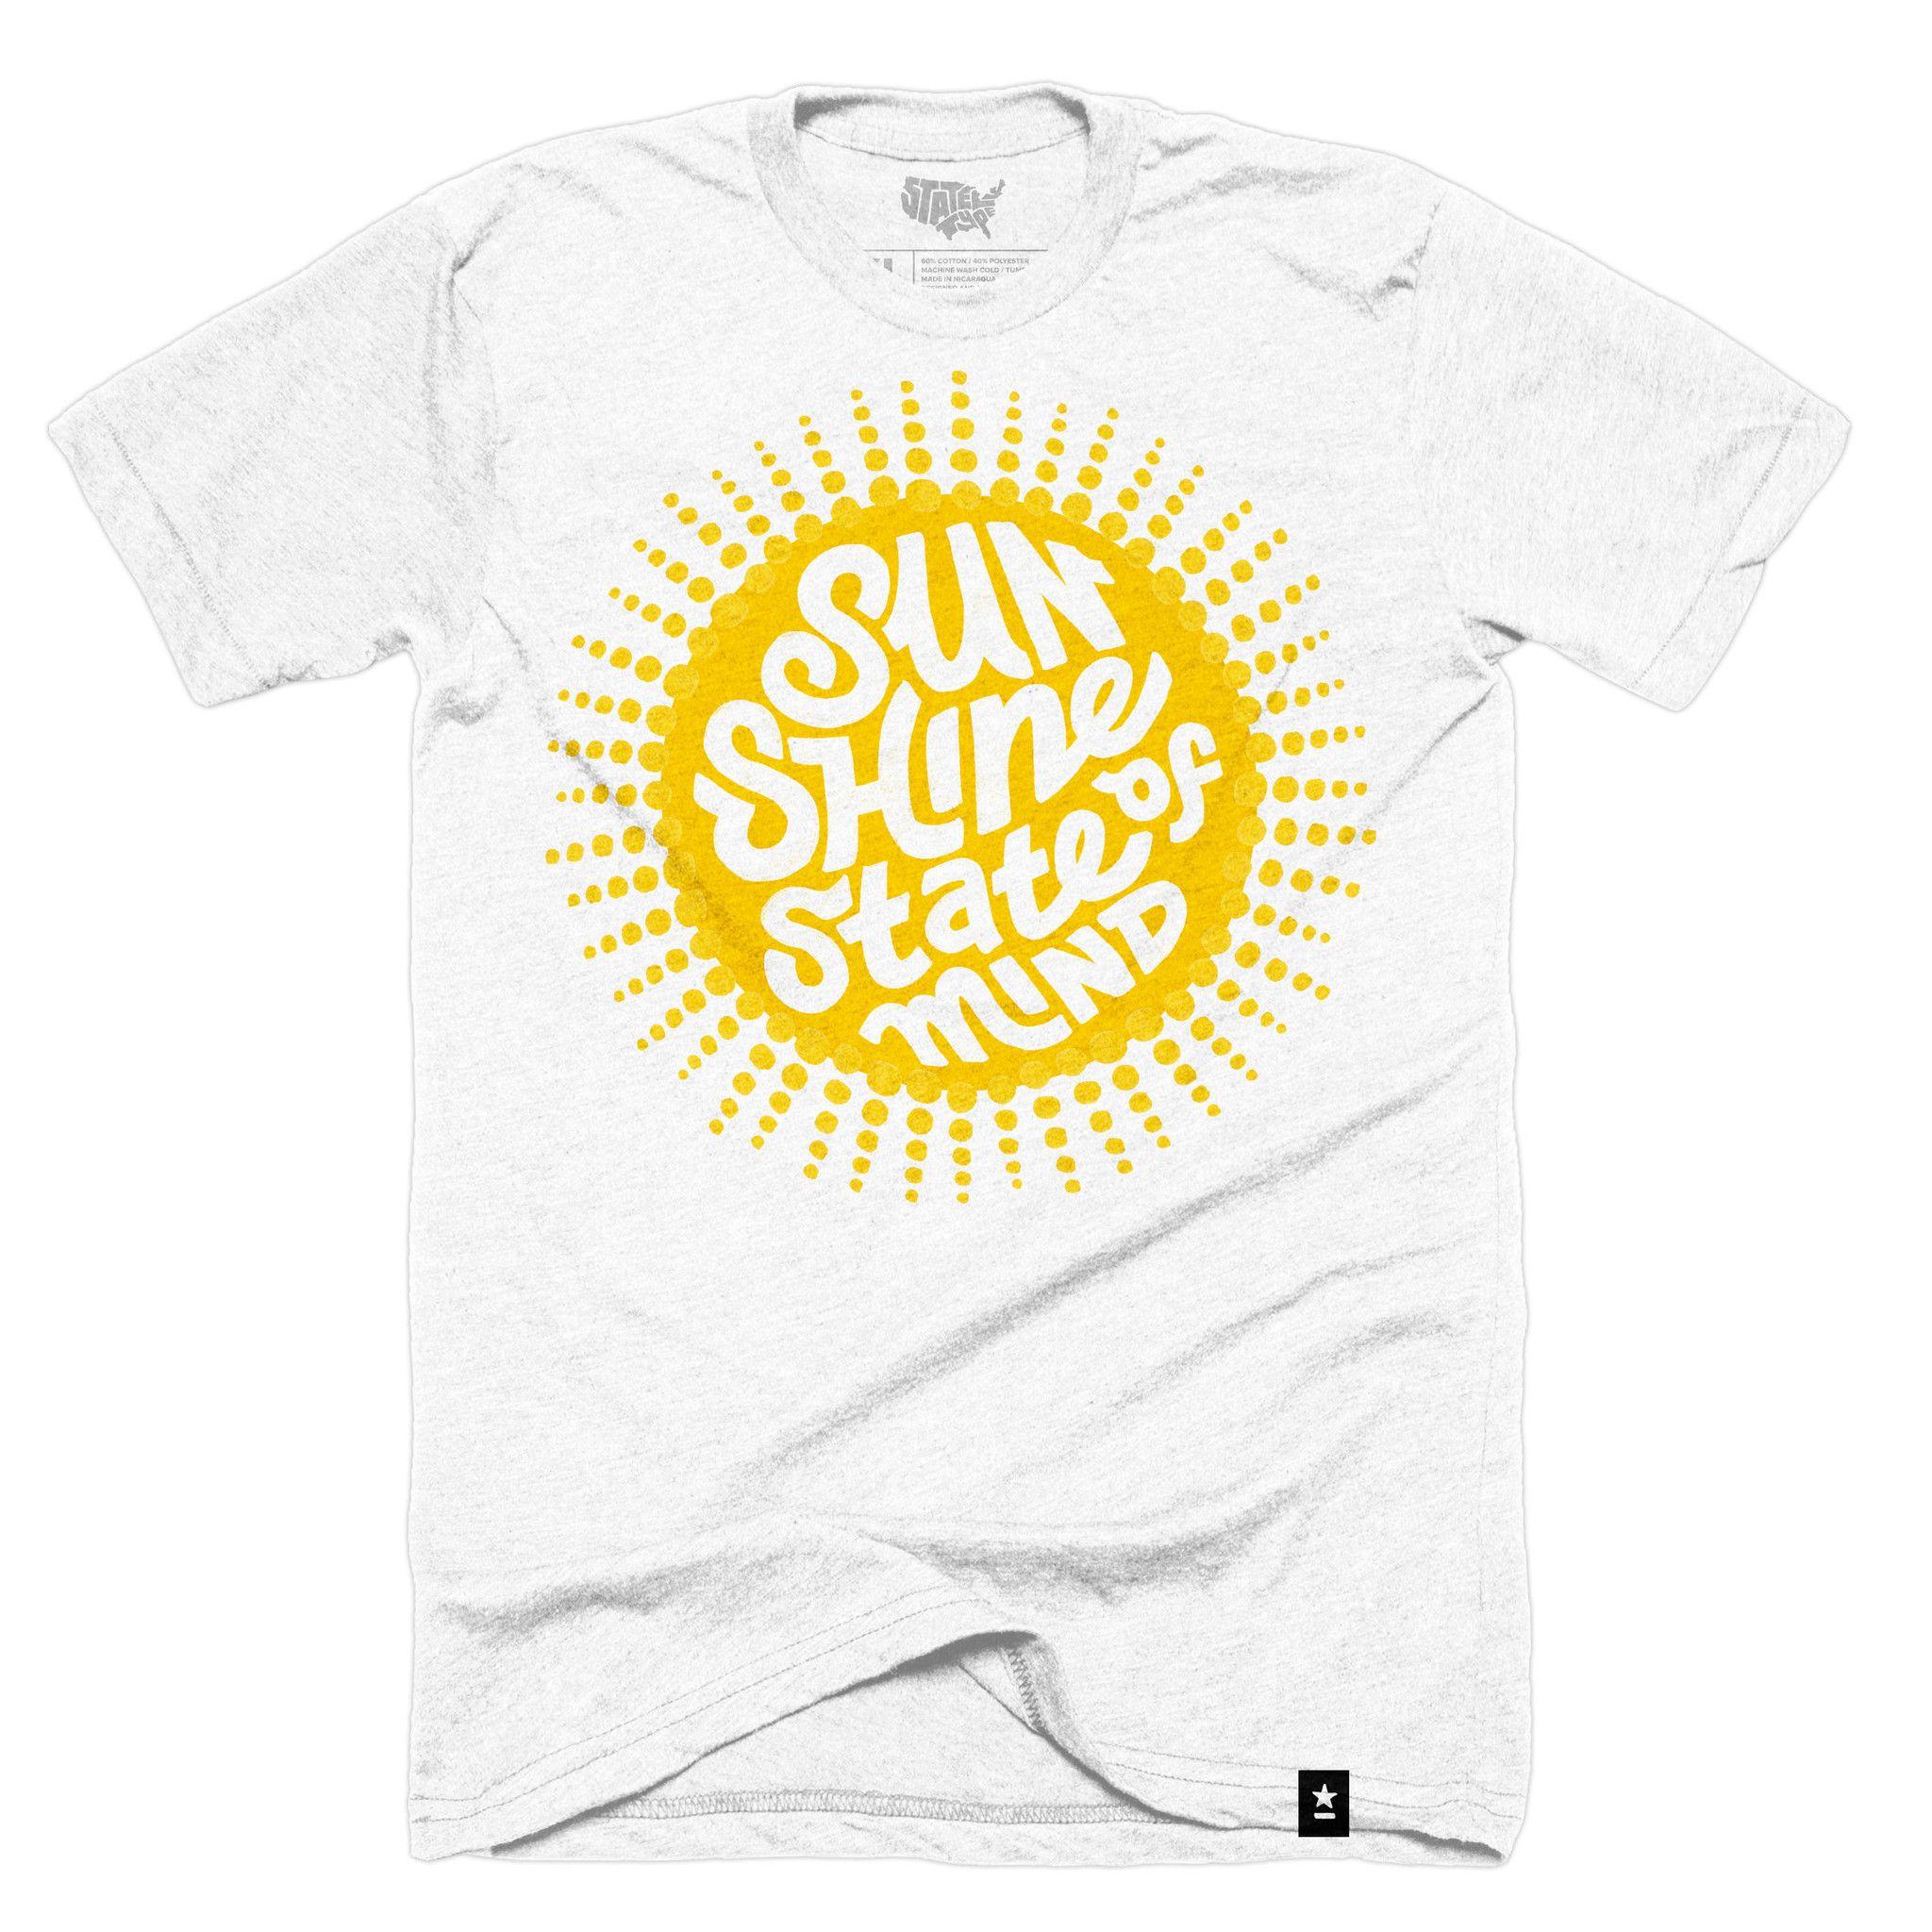 Florida Sunshine State Of Mind T Shirt Shirt Ideas Pinterest